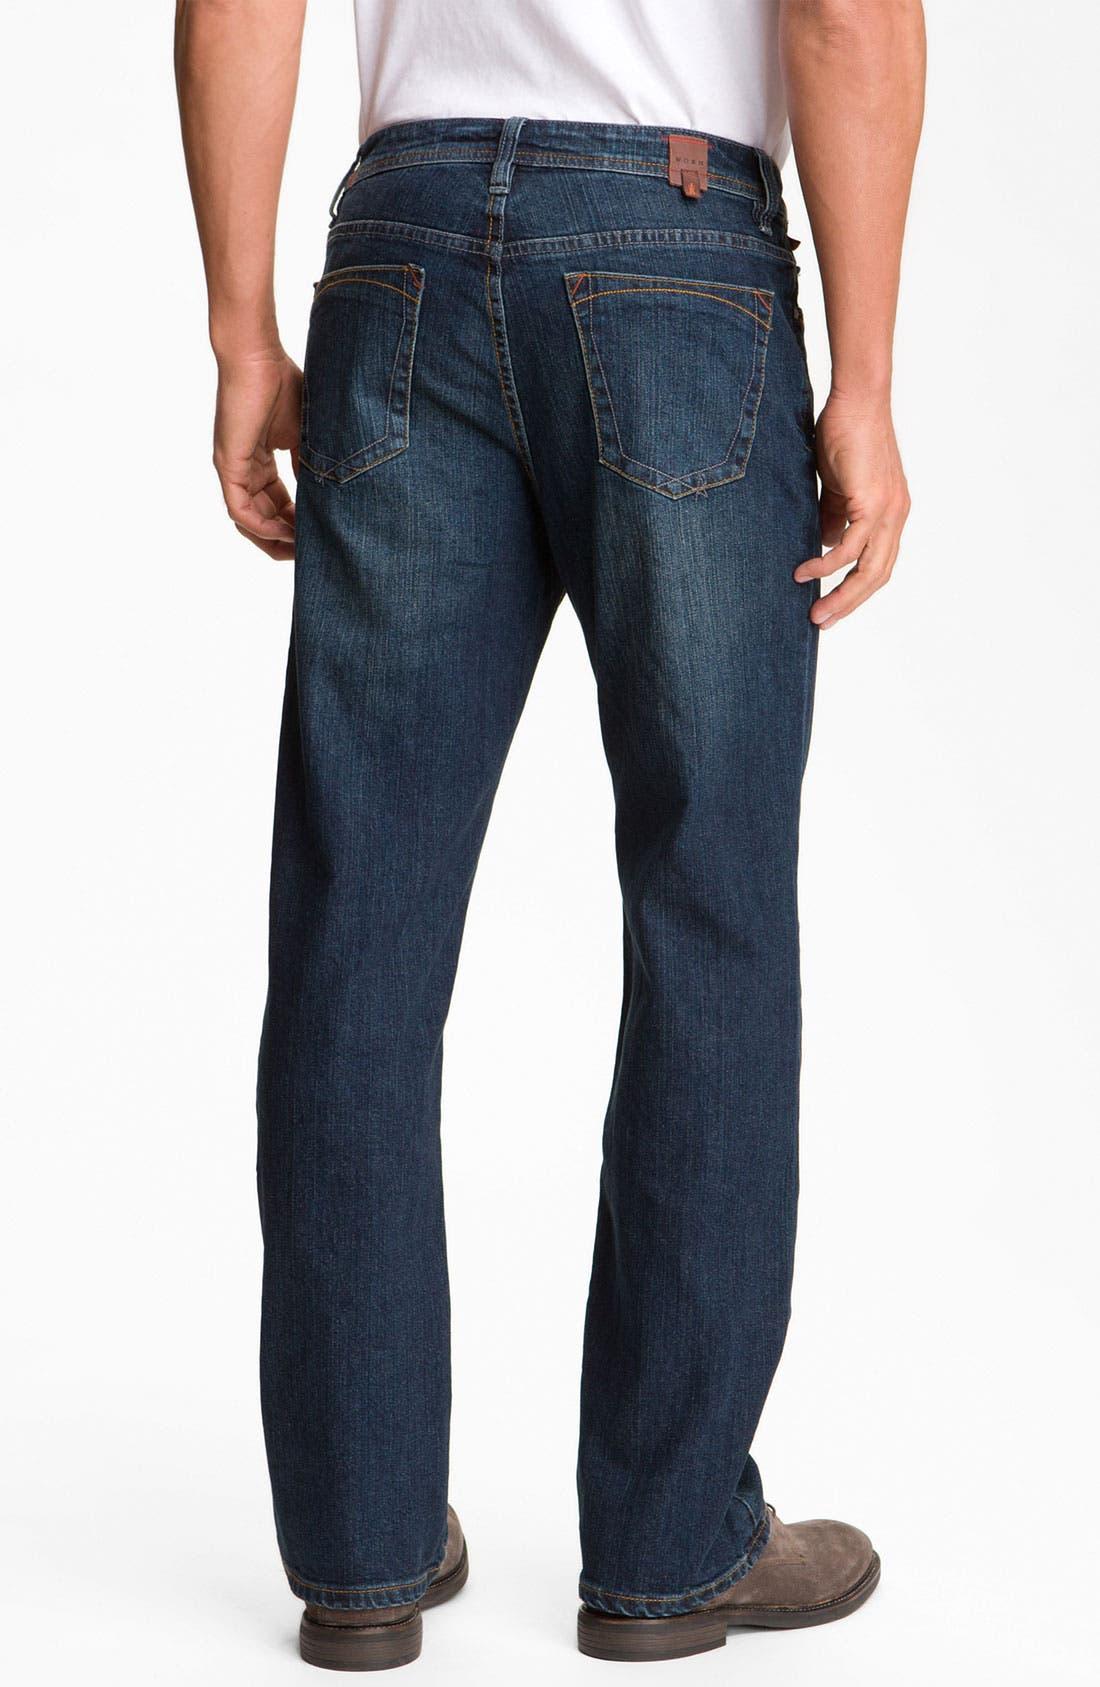 Alternate Image 2  - Worn Jeans 'Octane' Straight Leg Jeans (Clean Dark)